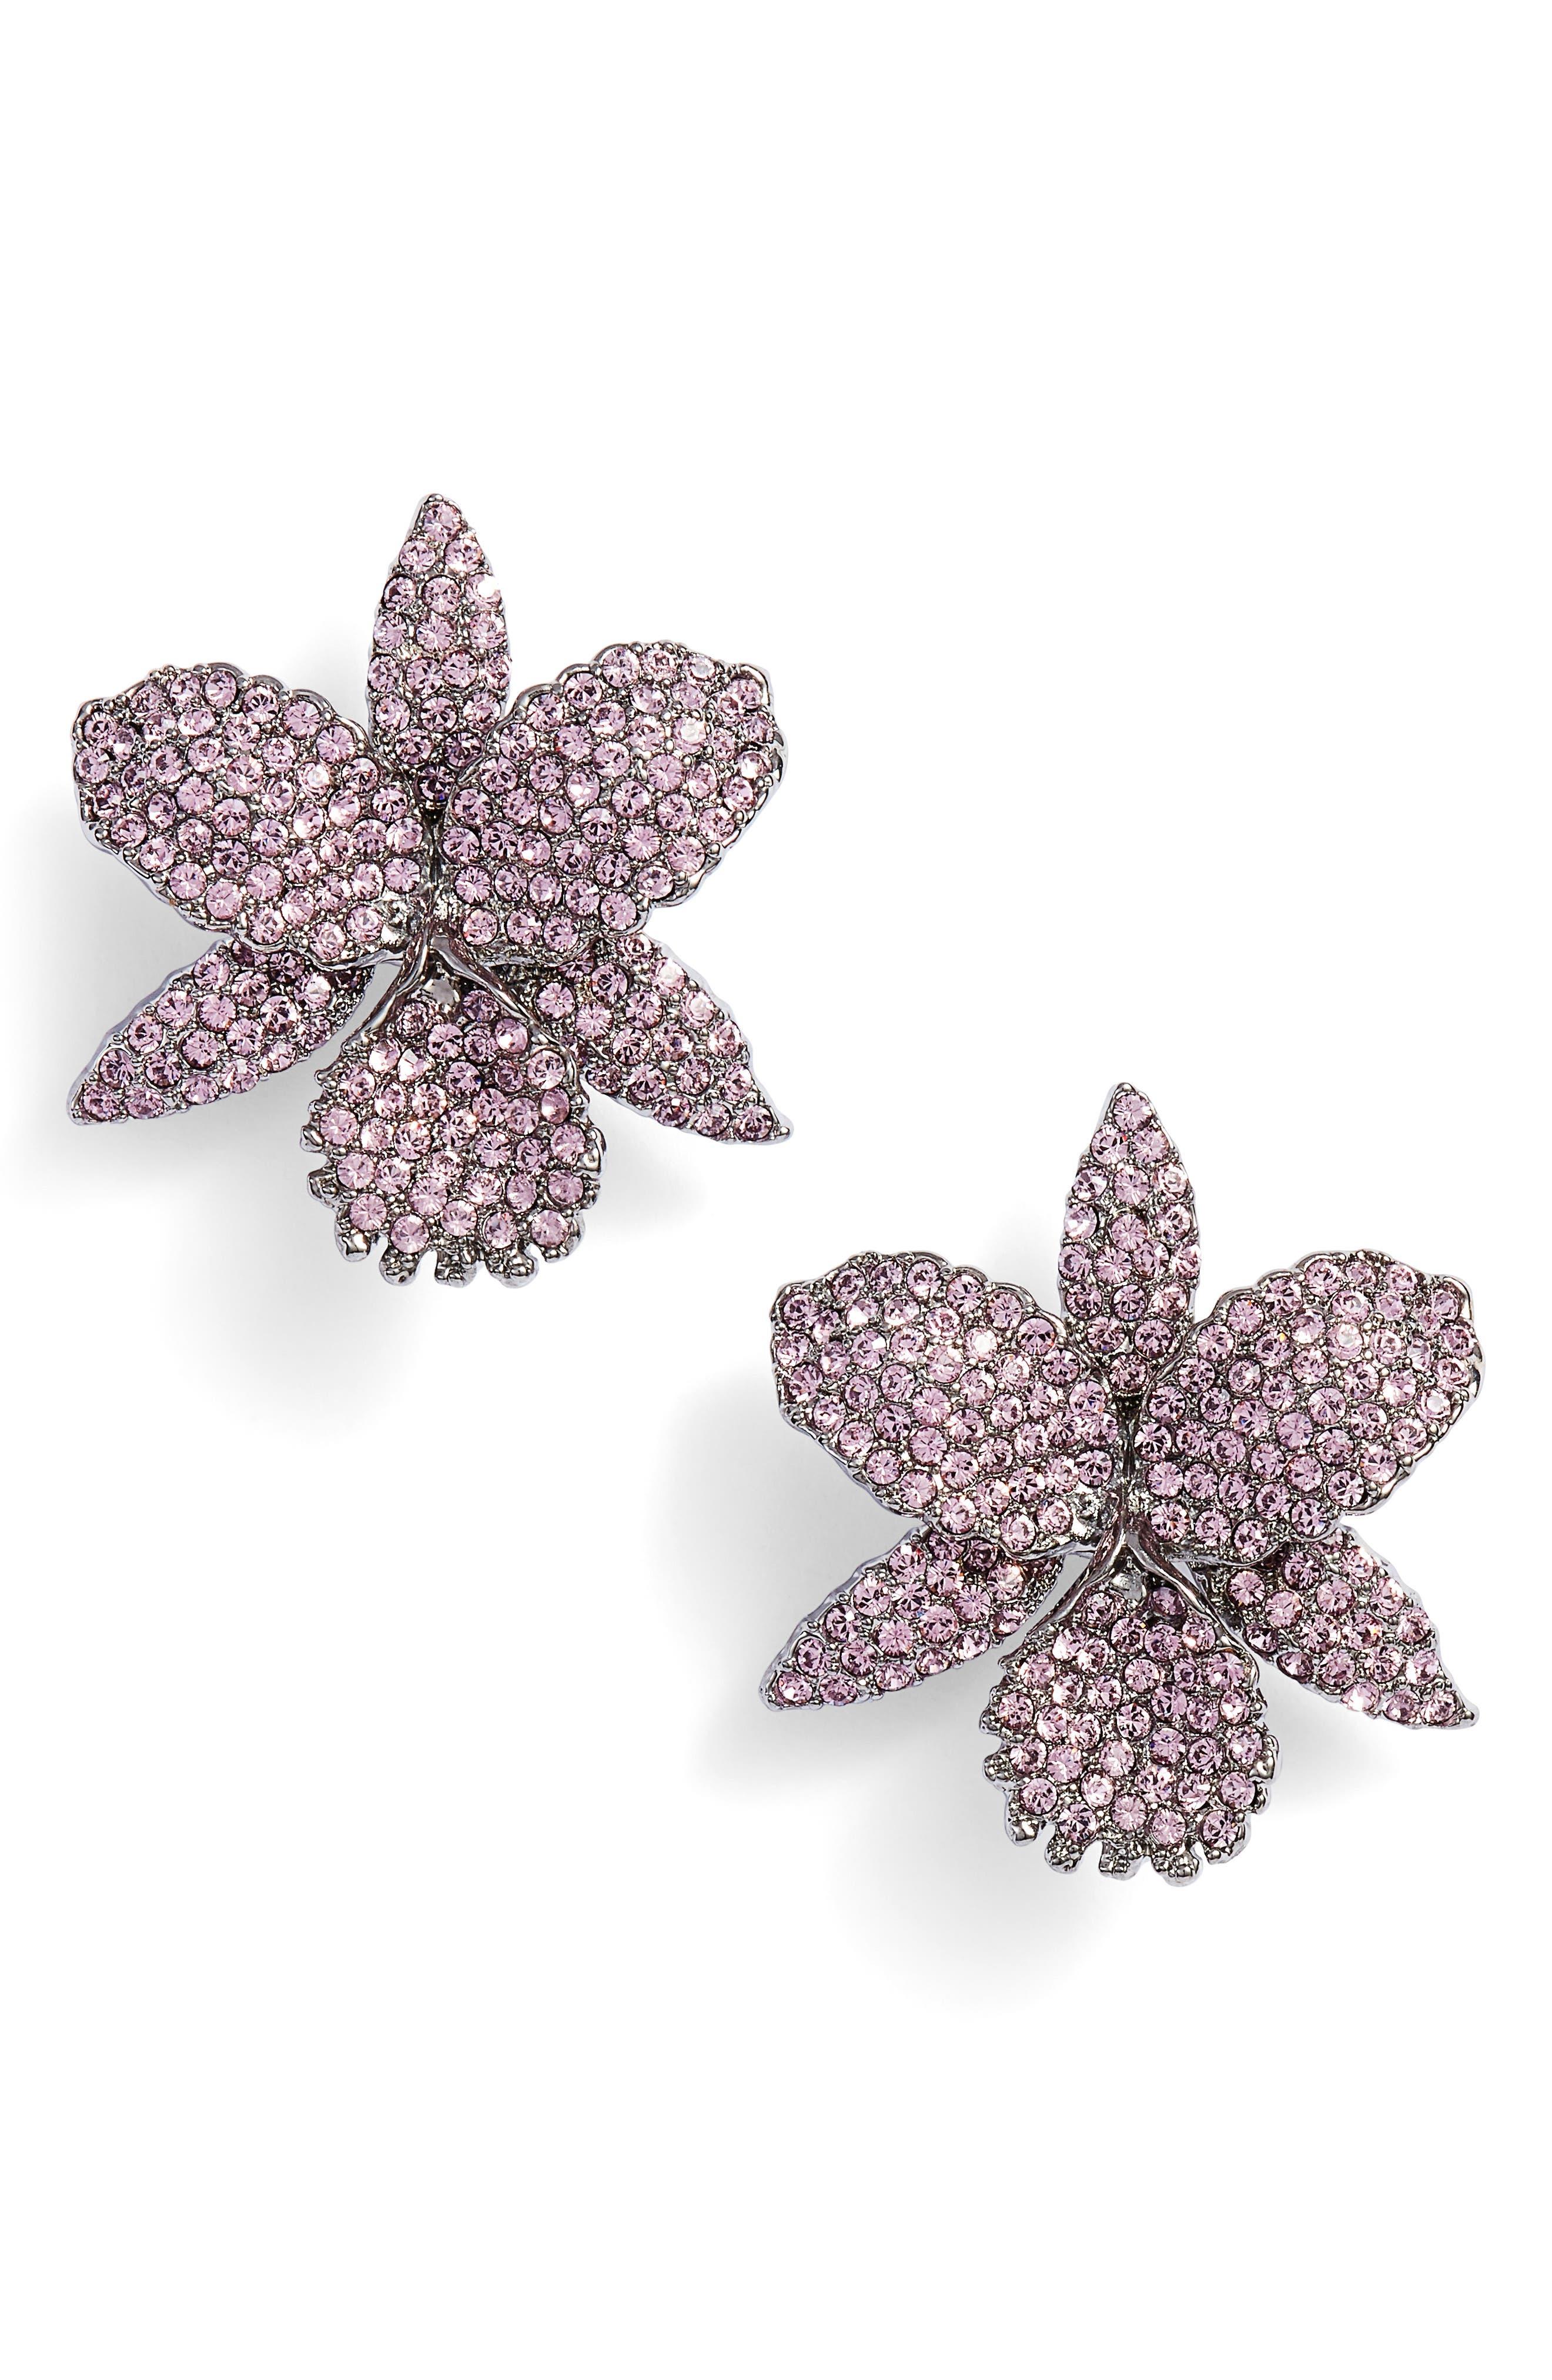 Nina Large Orchid Stud Earrings